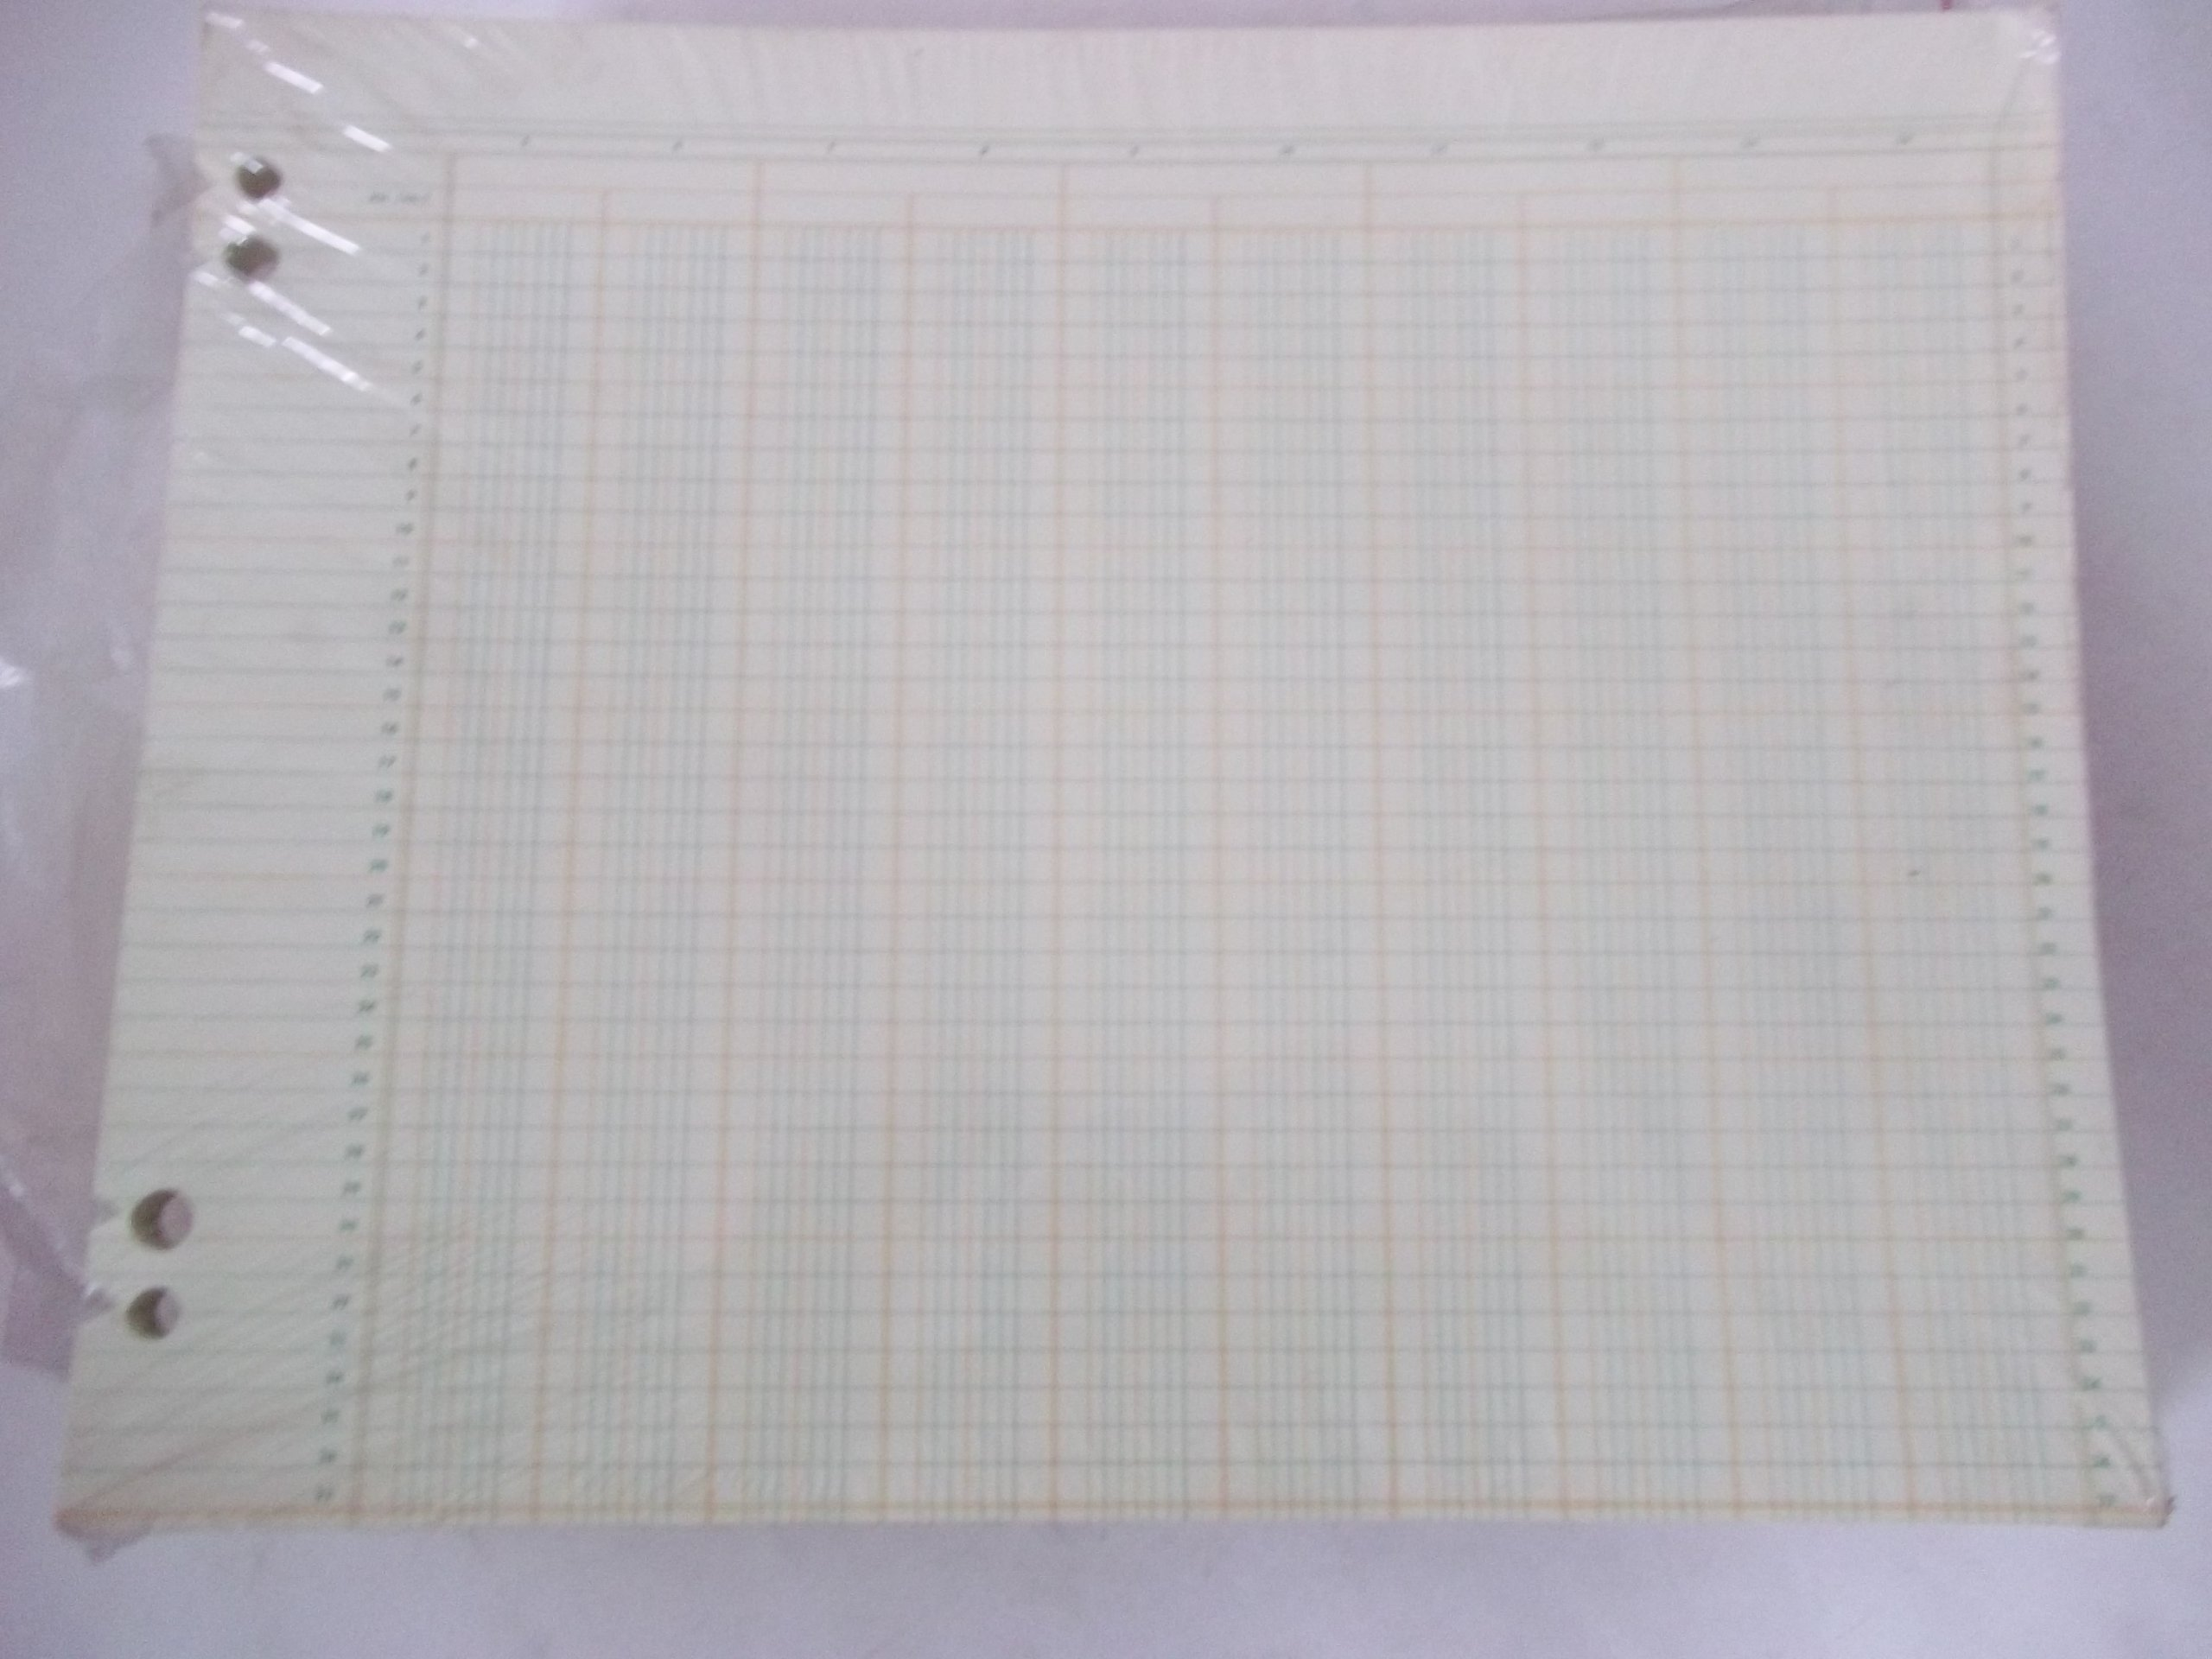 National Columnar Sheet RR 144-7 14 Columns 37 Line 11'' x 14'' Sold in Bulk Packages of 20 Sheets